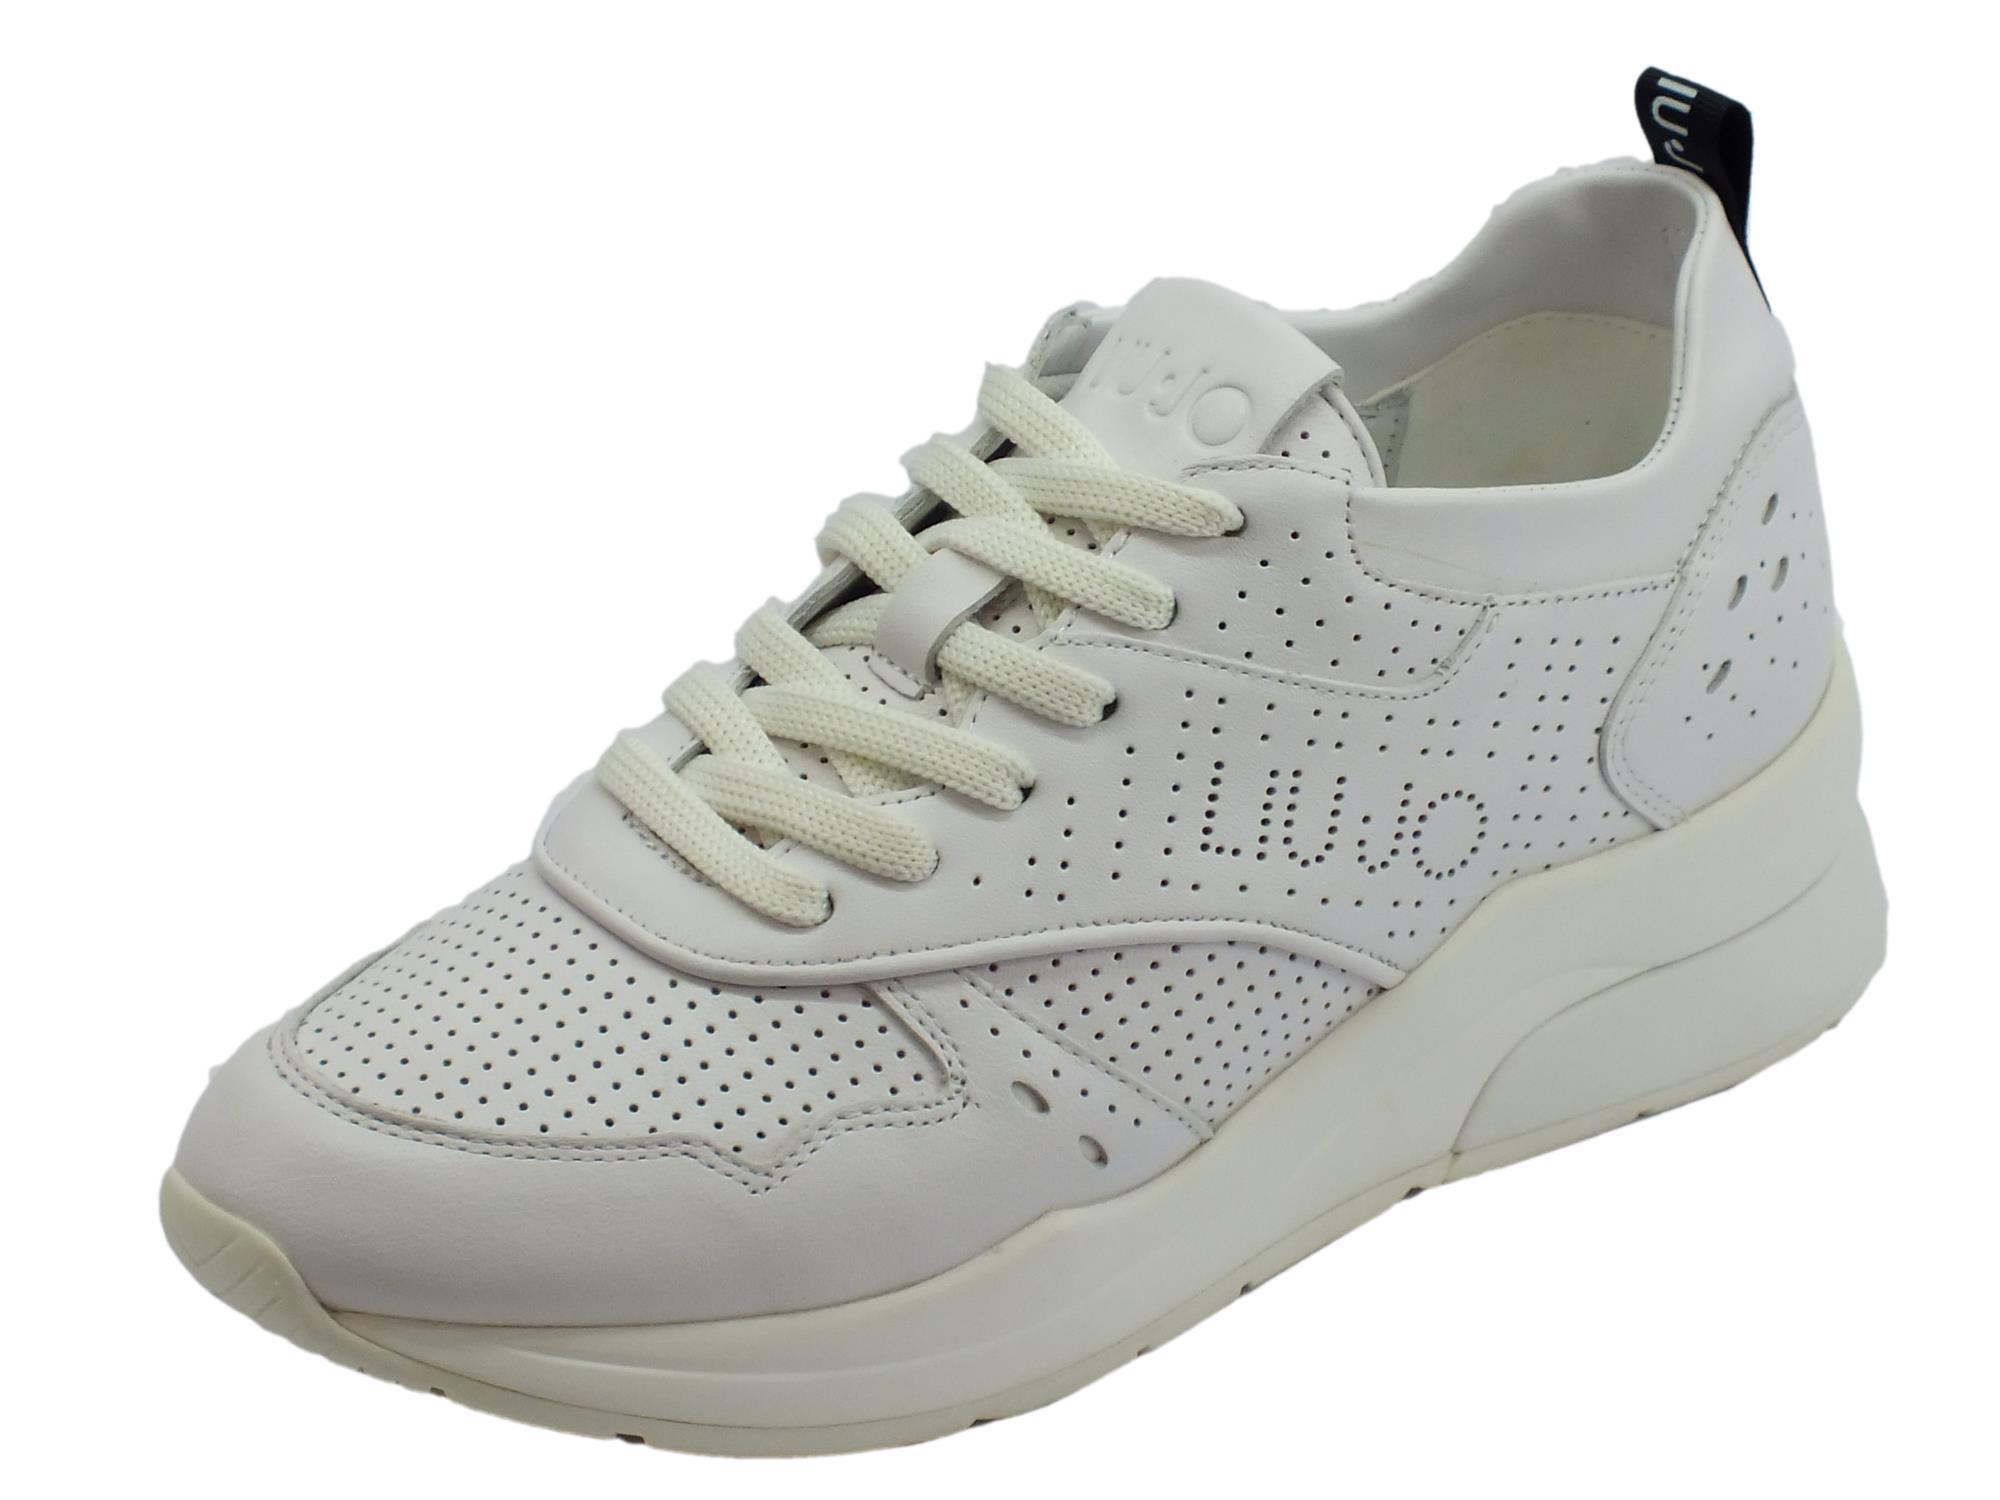 Sneakers Karlie LIU-JO donna pelle bianca zeppa alta - Vitiello ... a048b007234